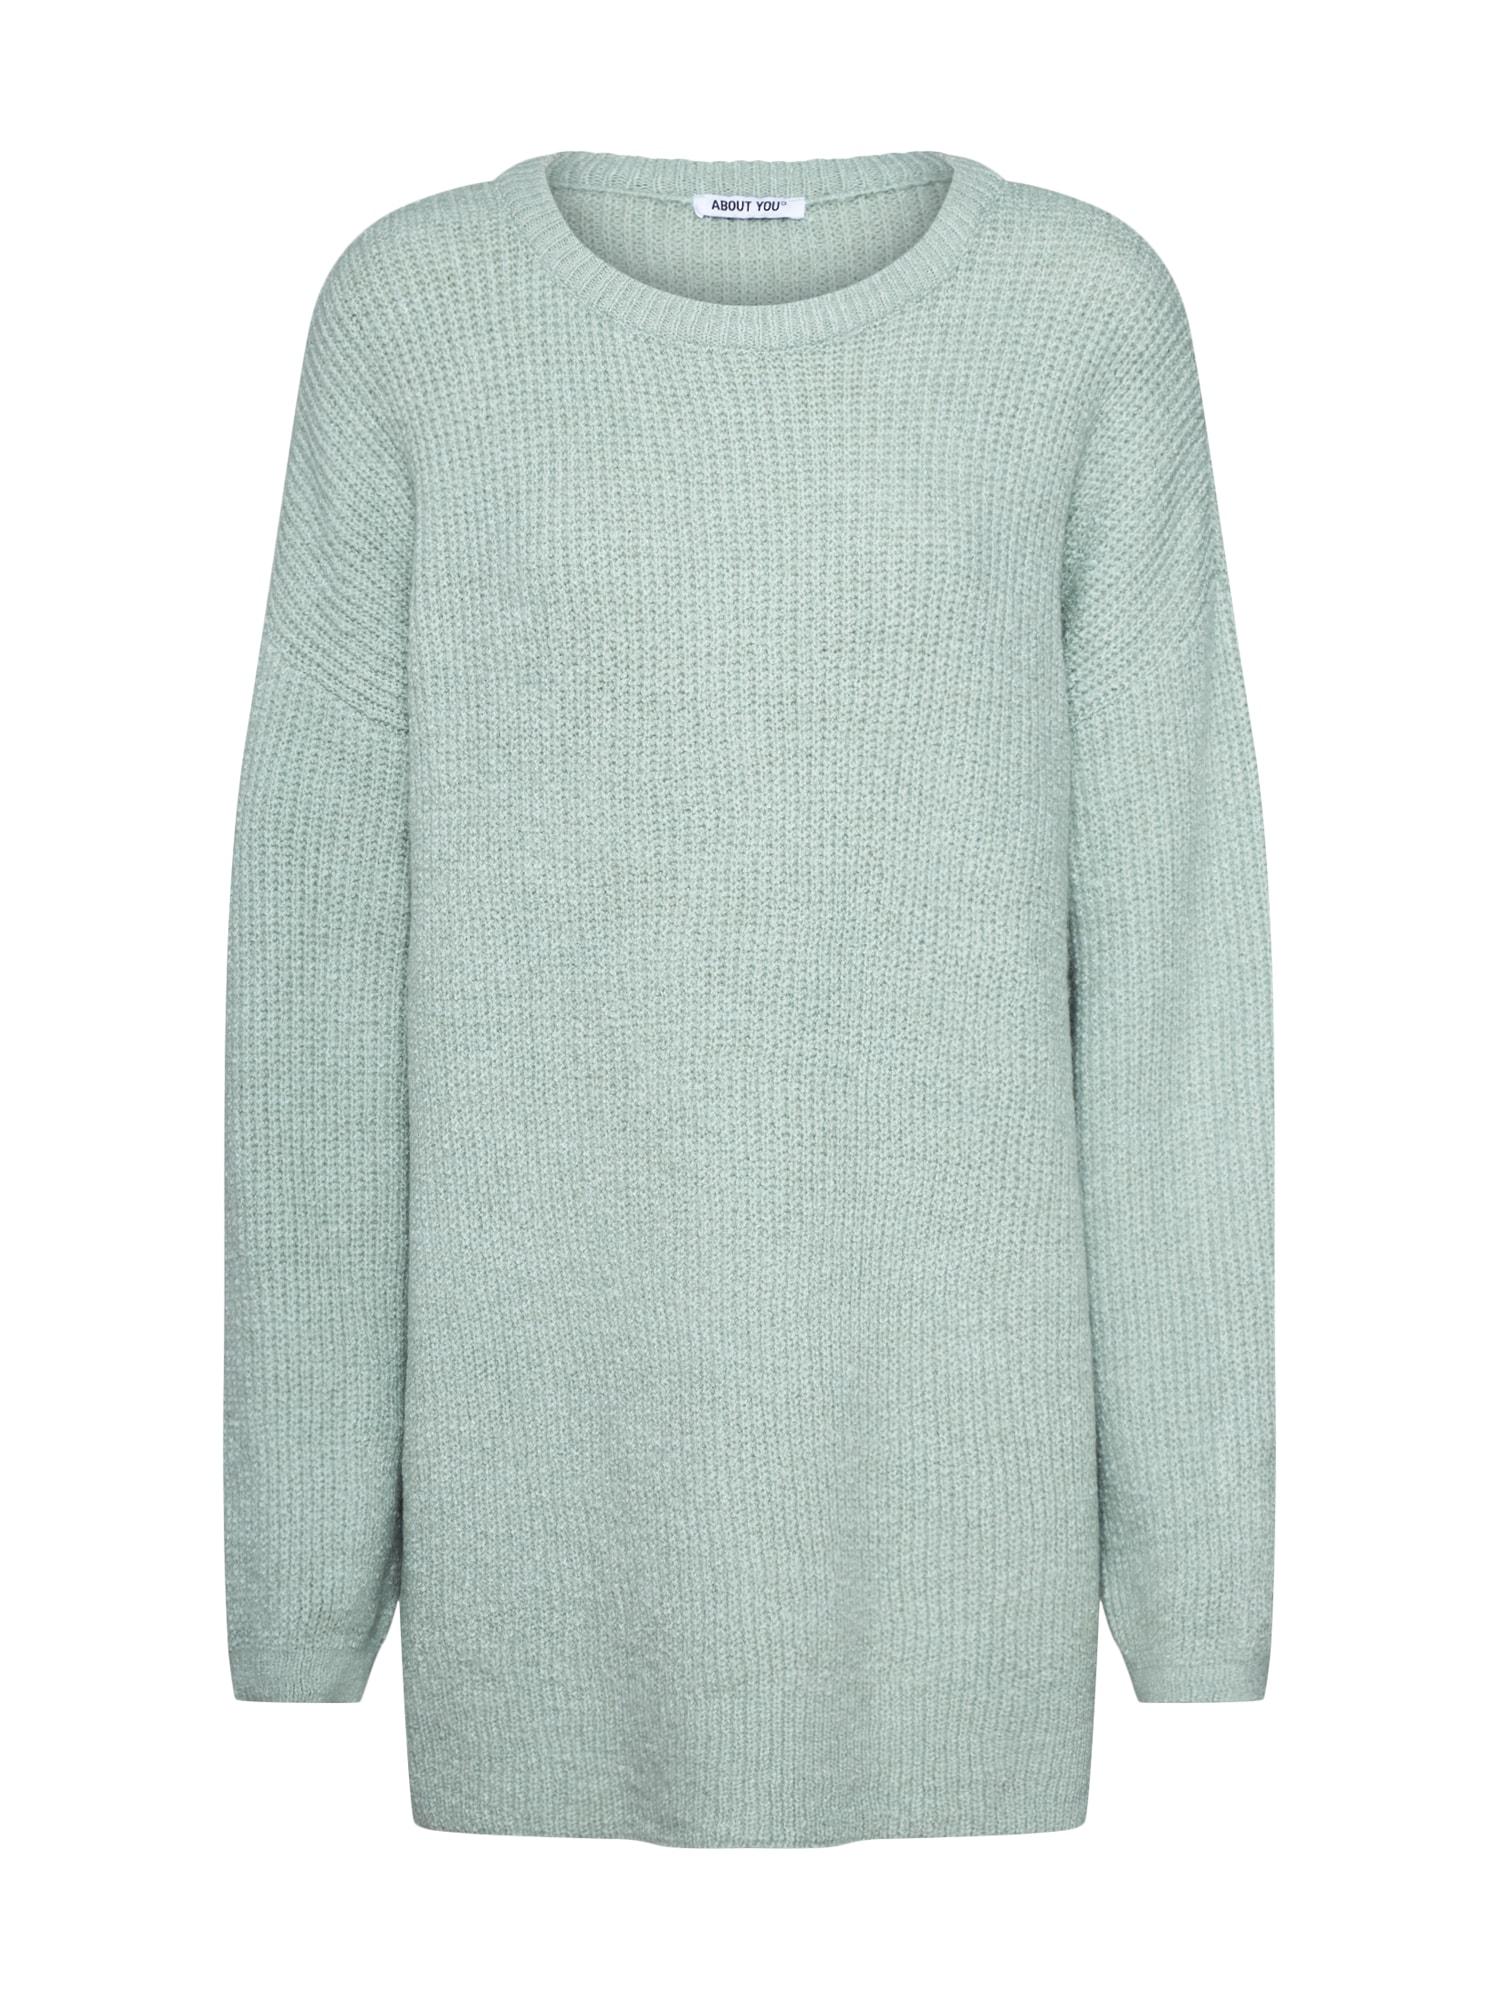 ABOUT YOU Laisvas megztinis 'Mina' mėtų spalva